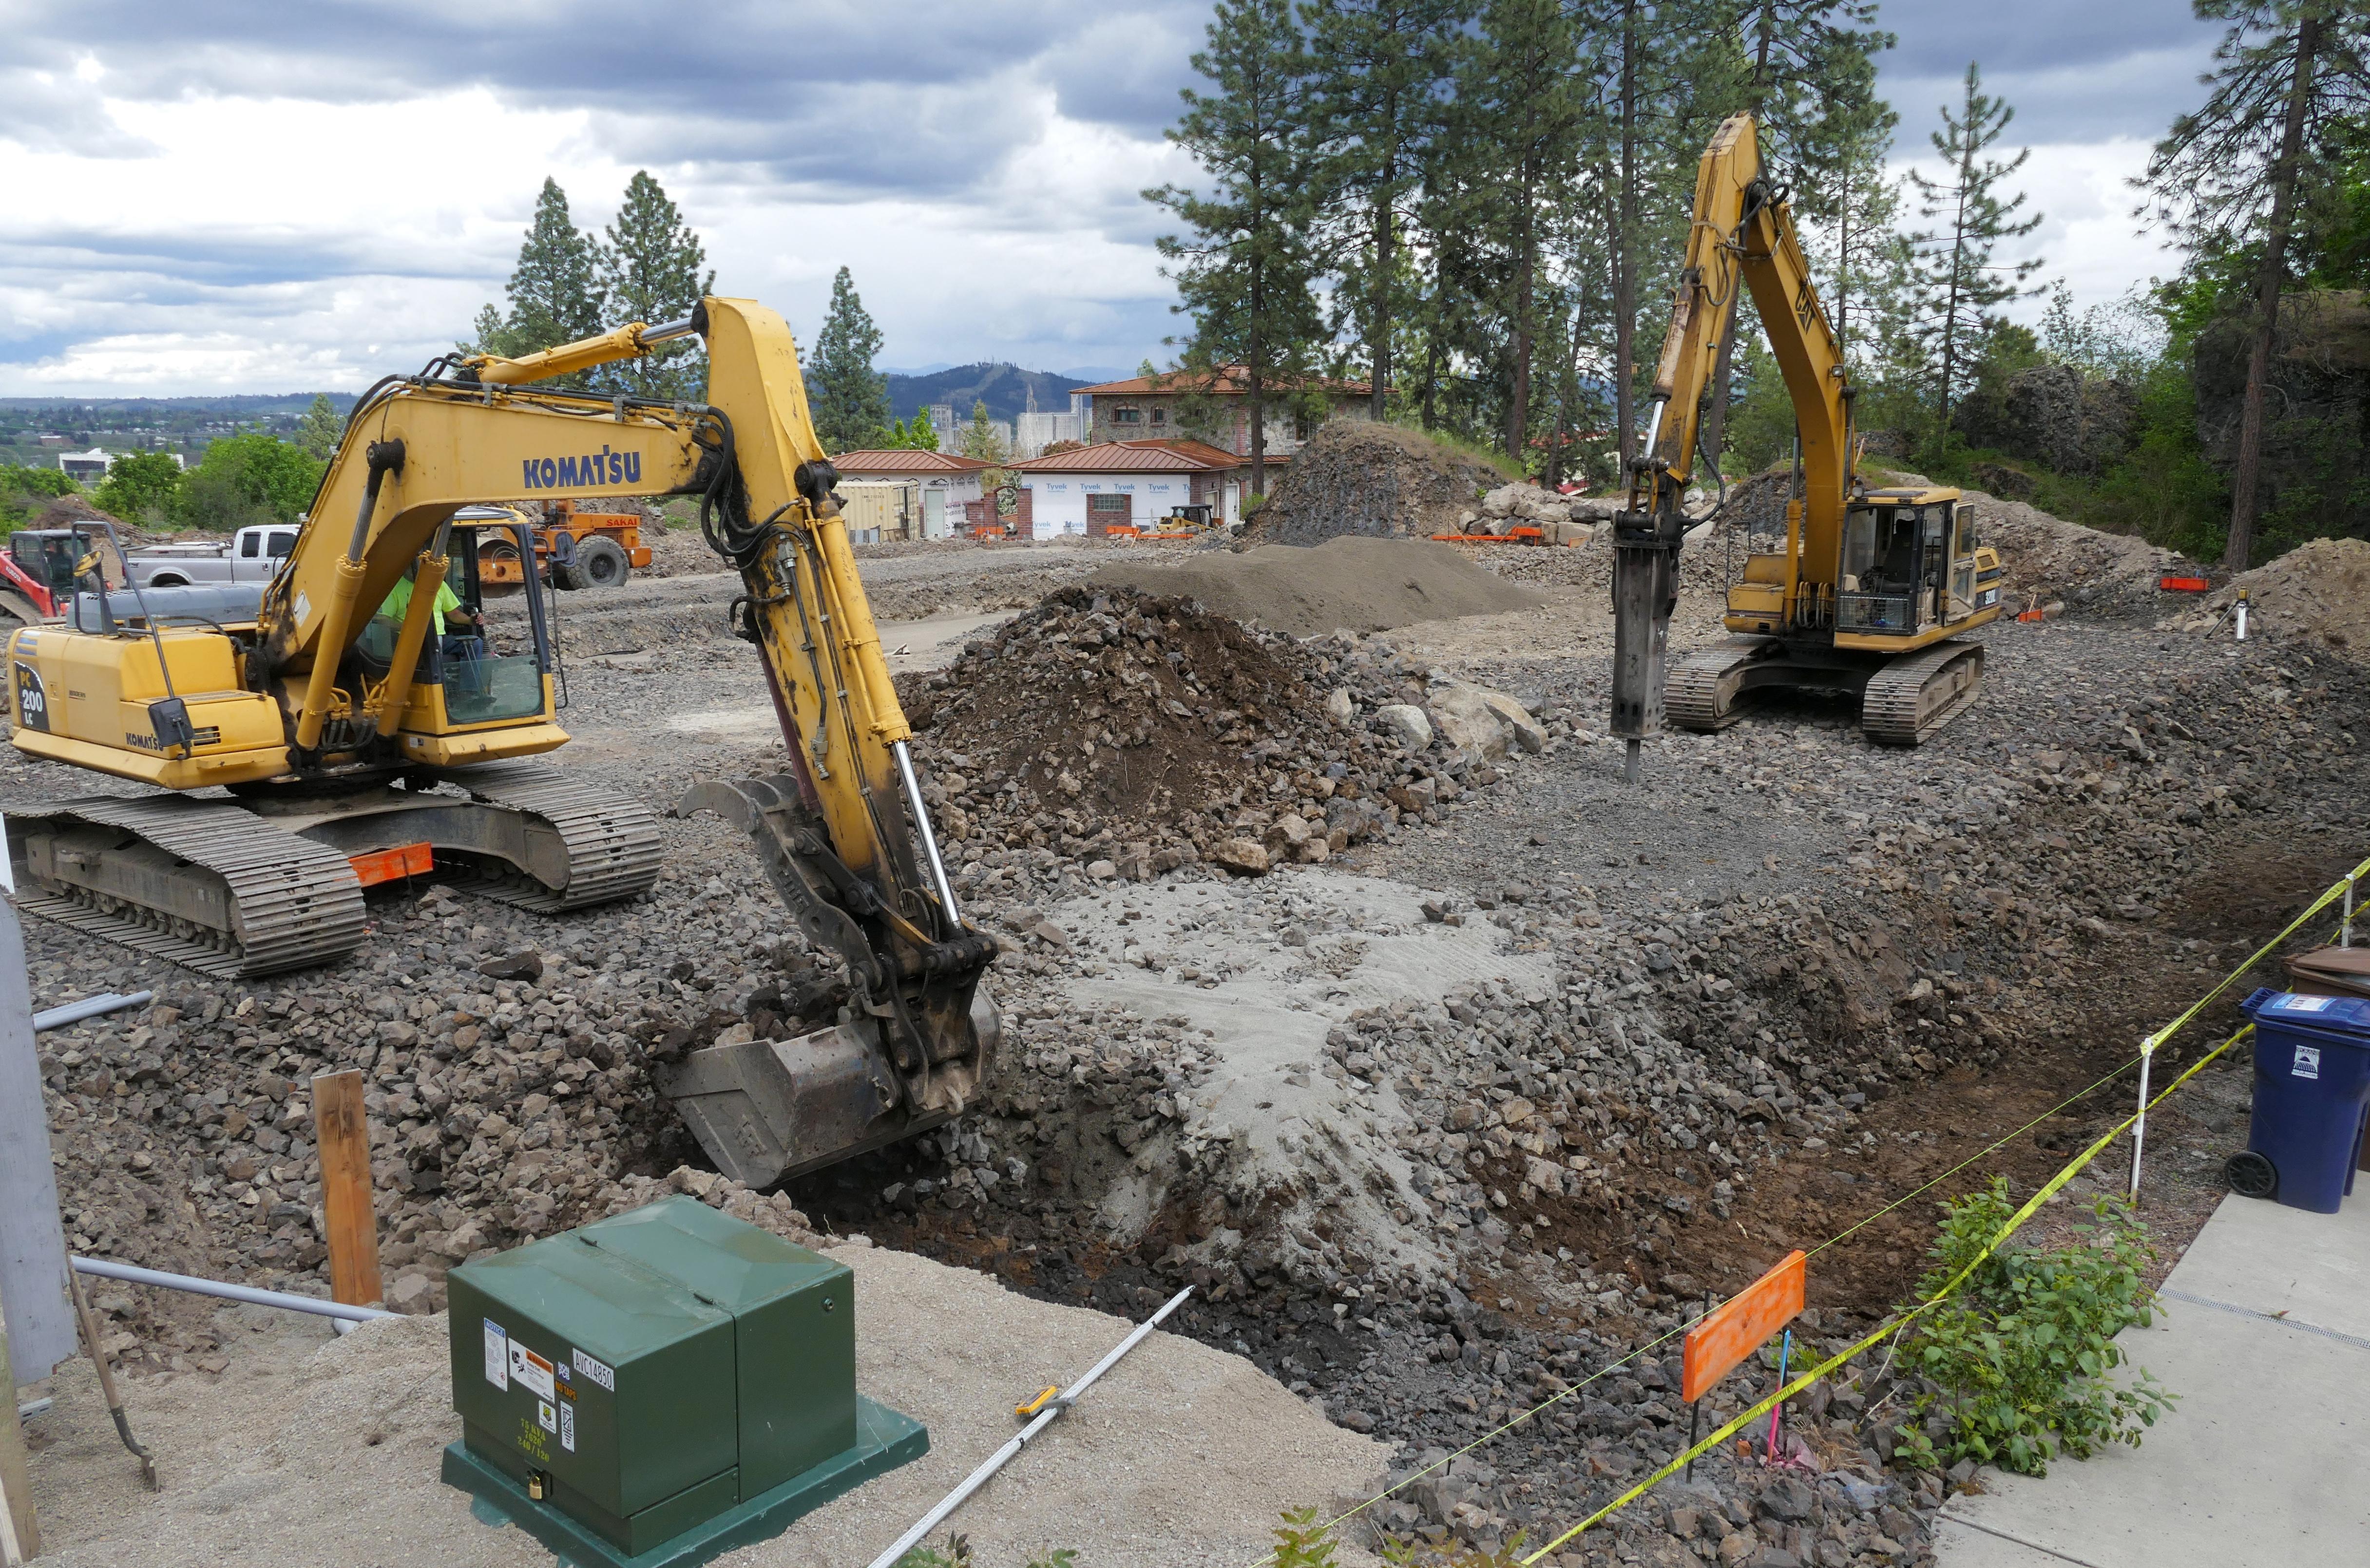 Contractor association: Spokane region third fastest growing